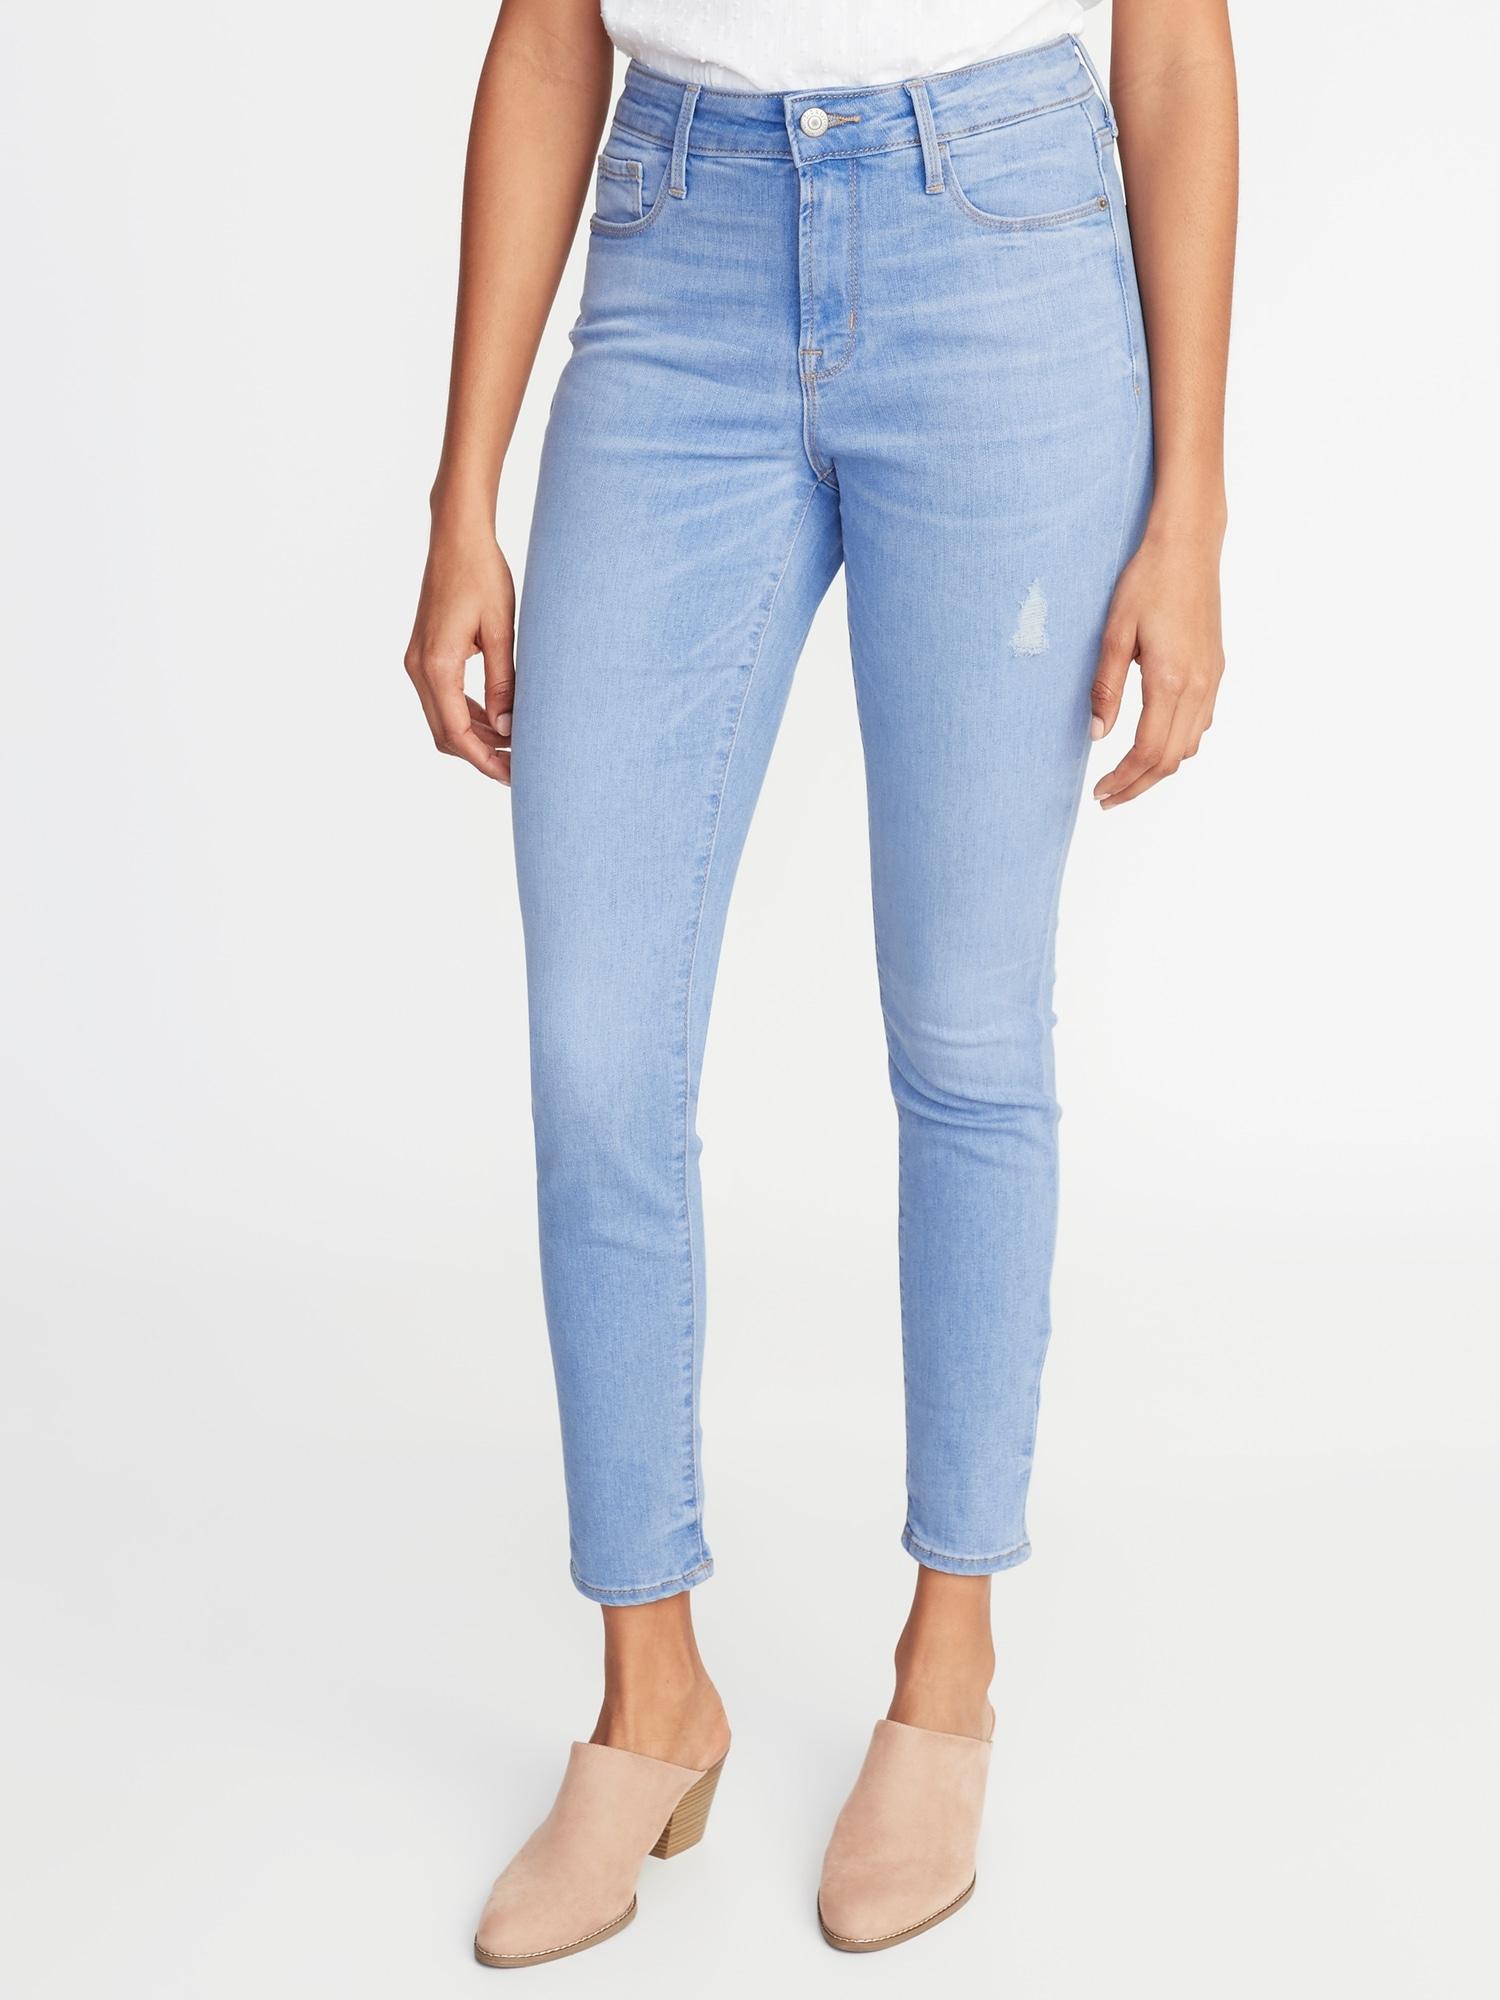 5033cf6aa8f High-Rise Secret-Slim Pockets Distressed Rockstar Super Skinny Jeans for  Women